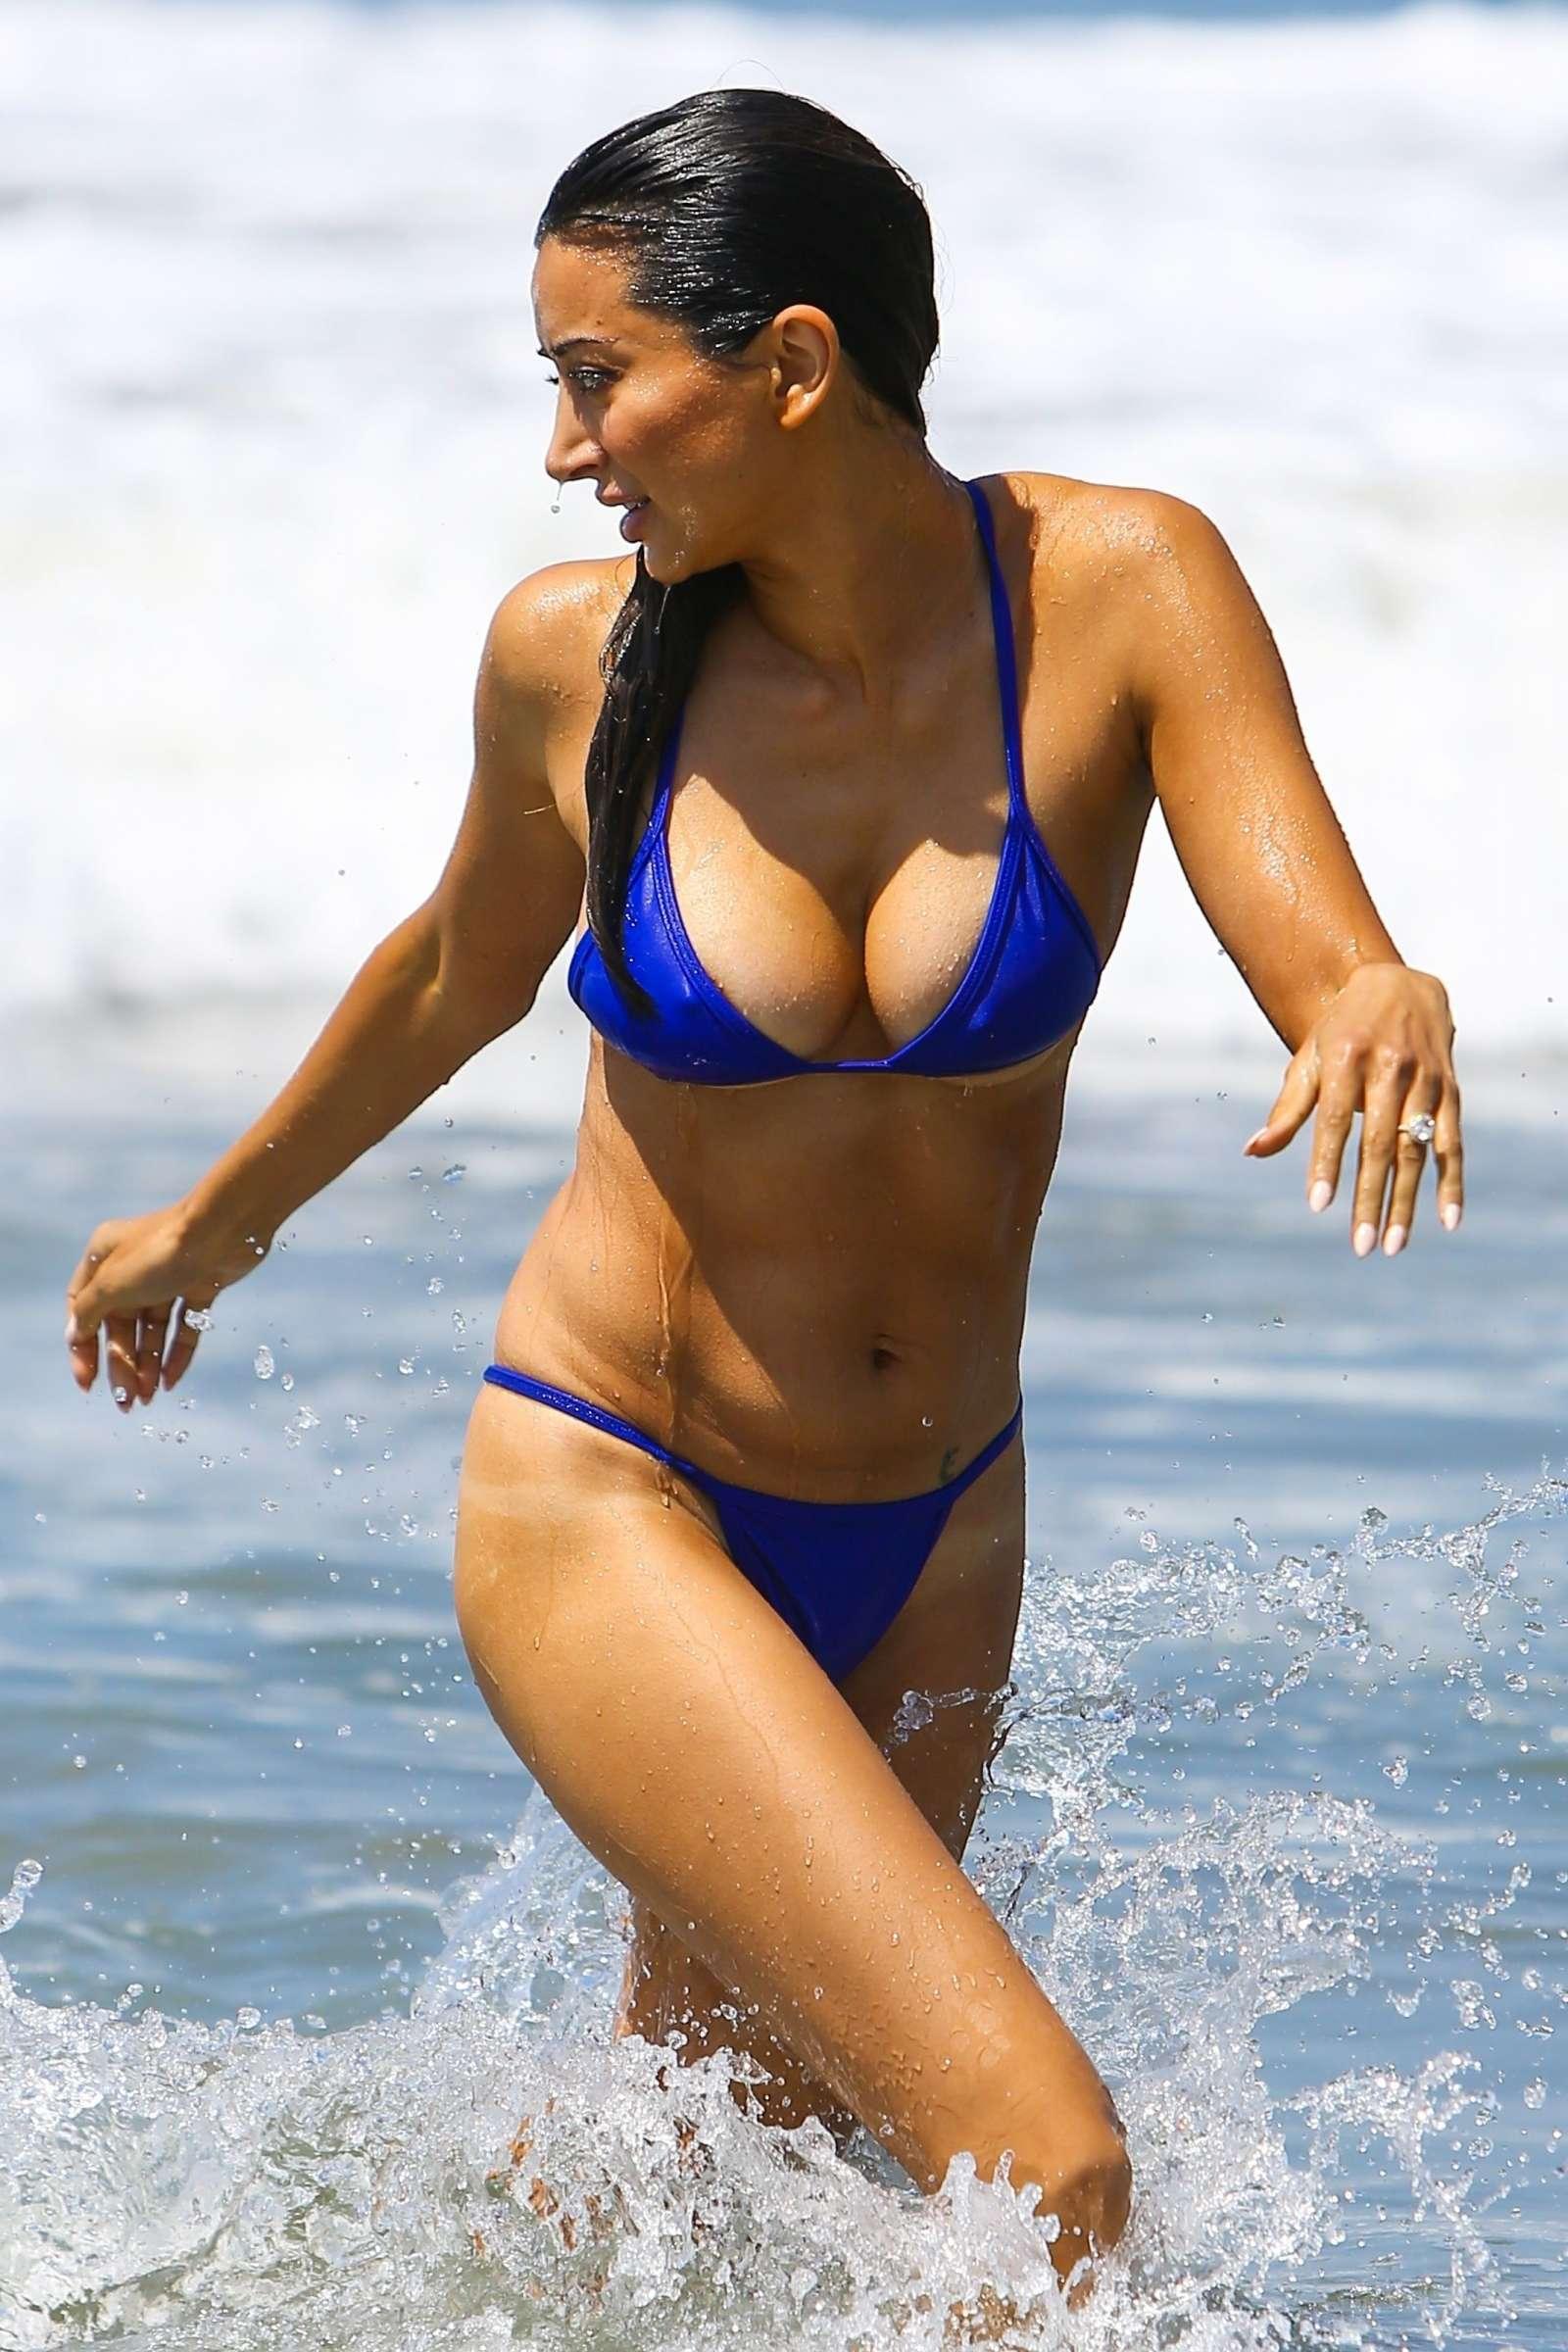 Images Noureen DeWulf nudes (34 photos), Topless, Sideboobs, Twitter, in bikini 2020